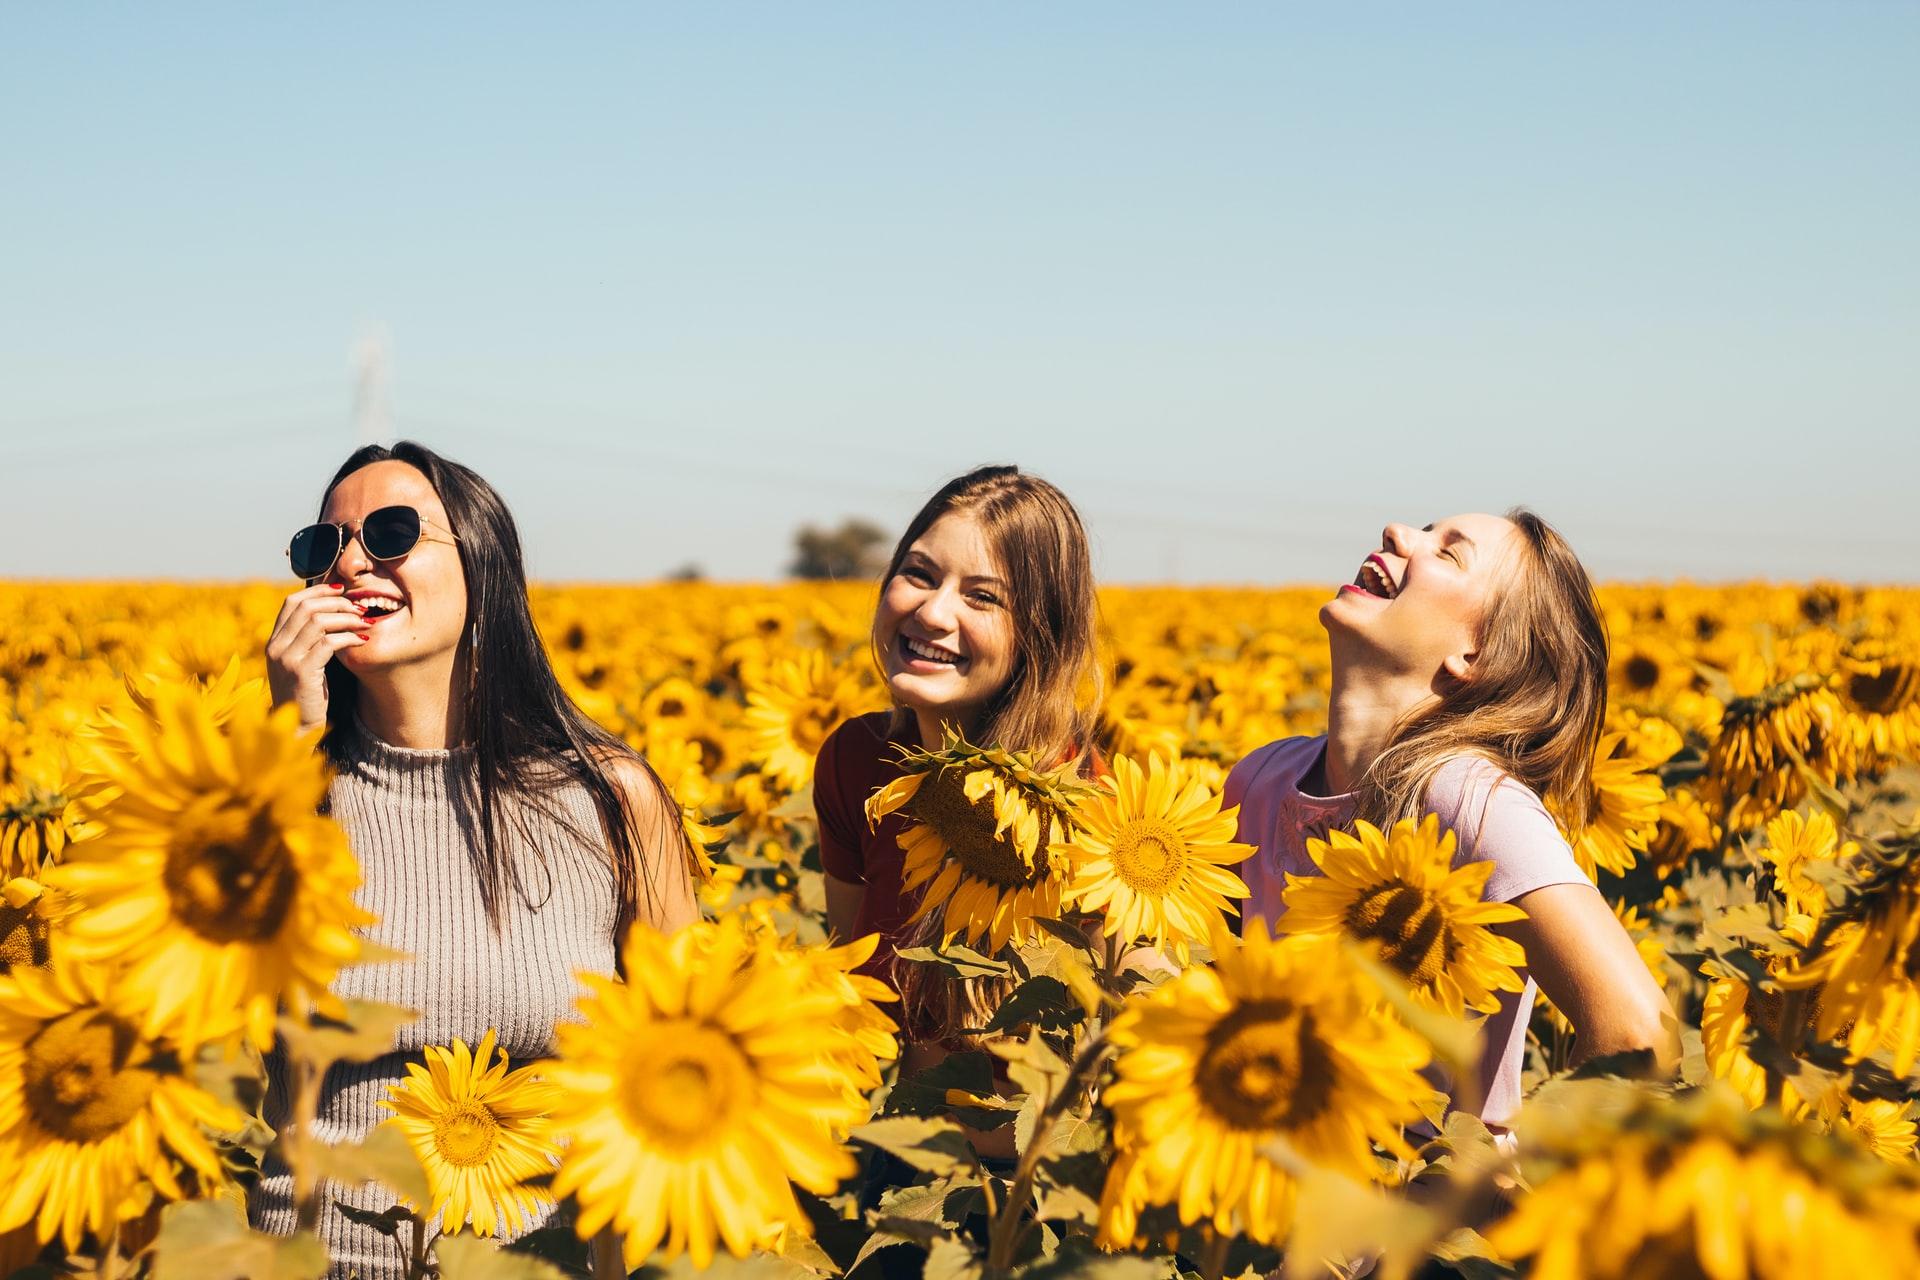 foto trucos mejores fotos alsa viajar chicas girasoles